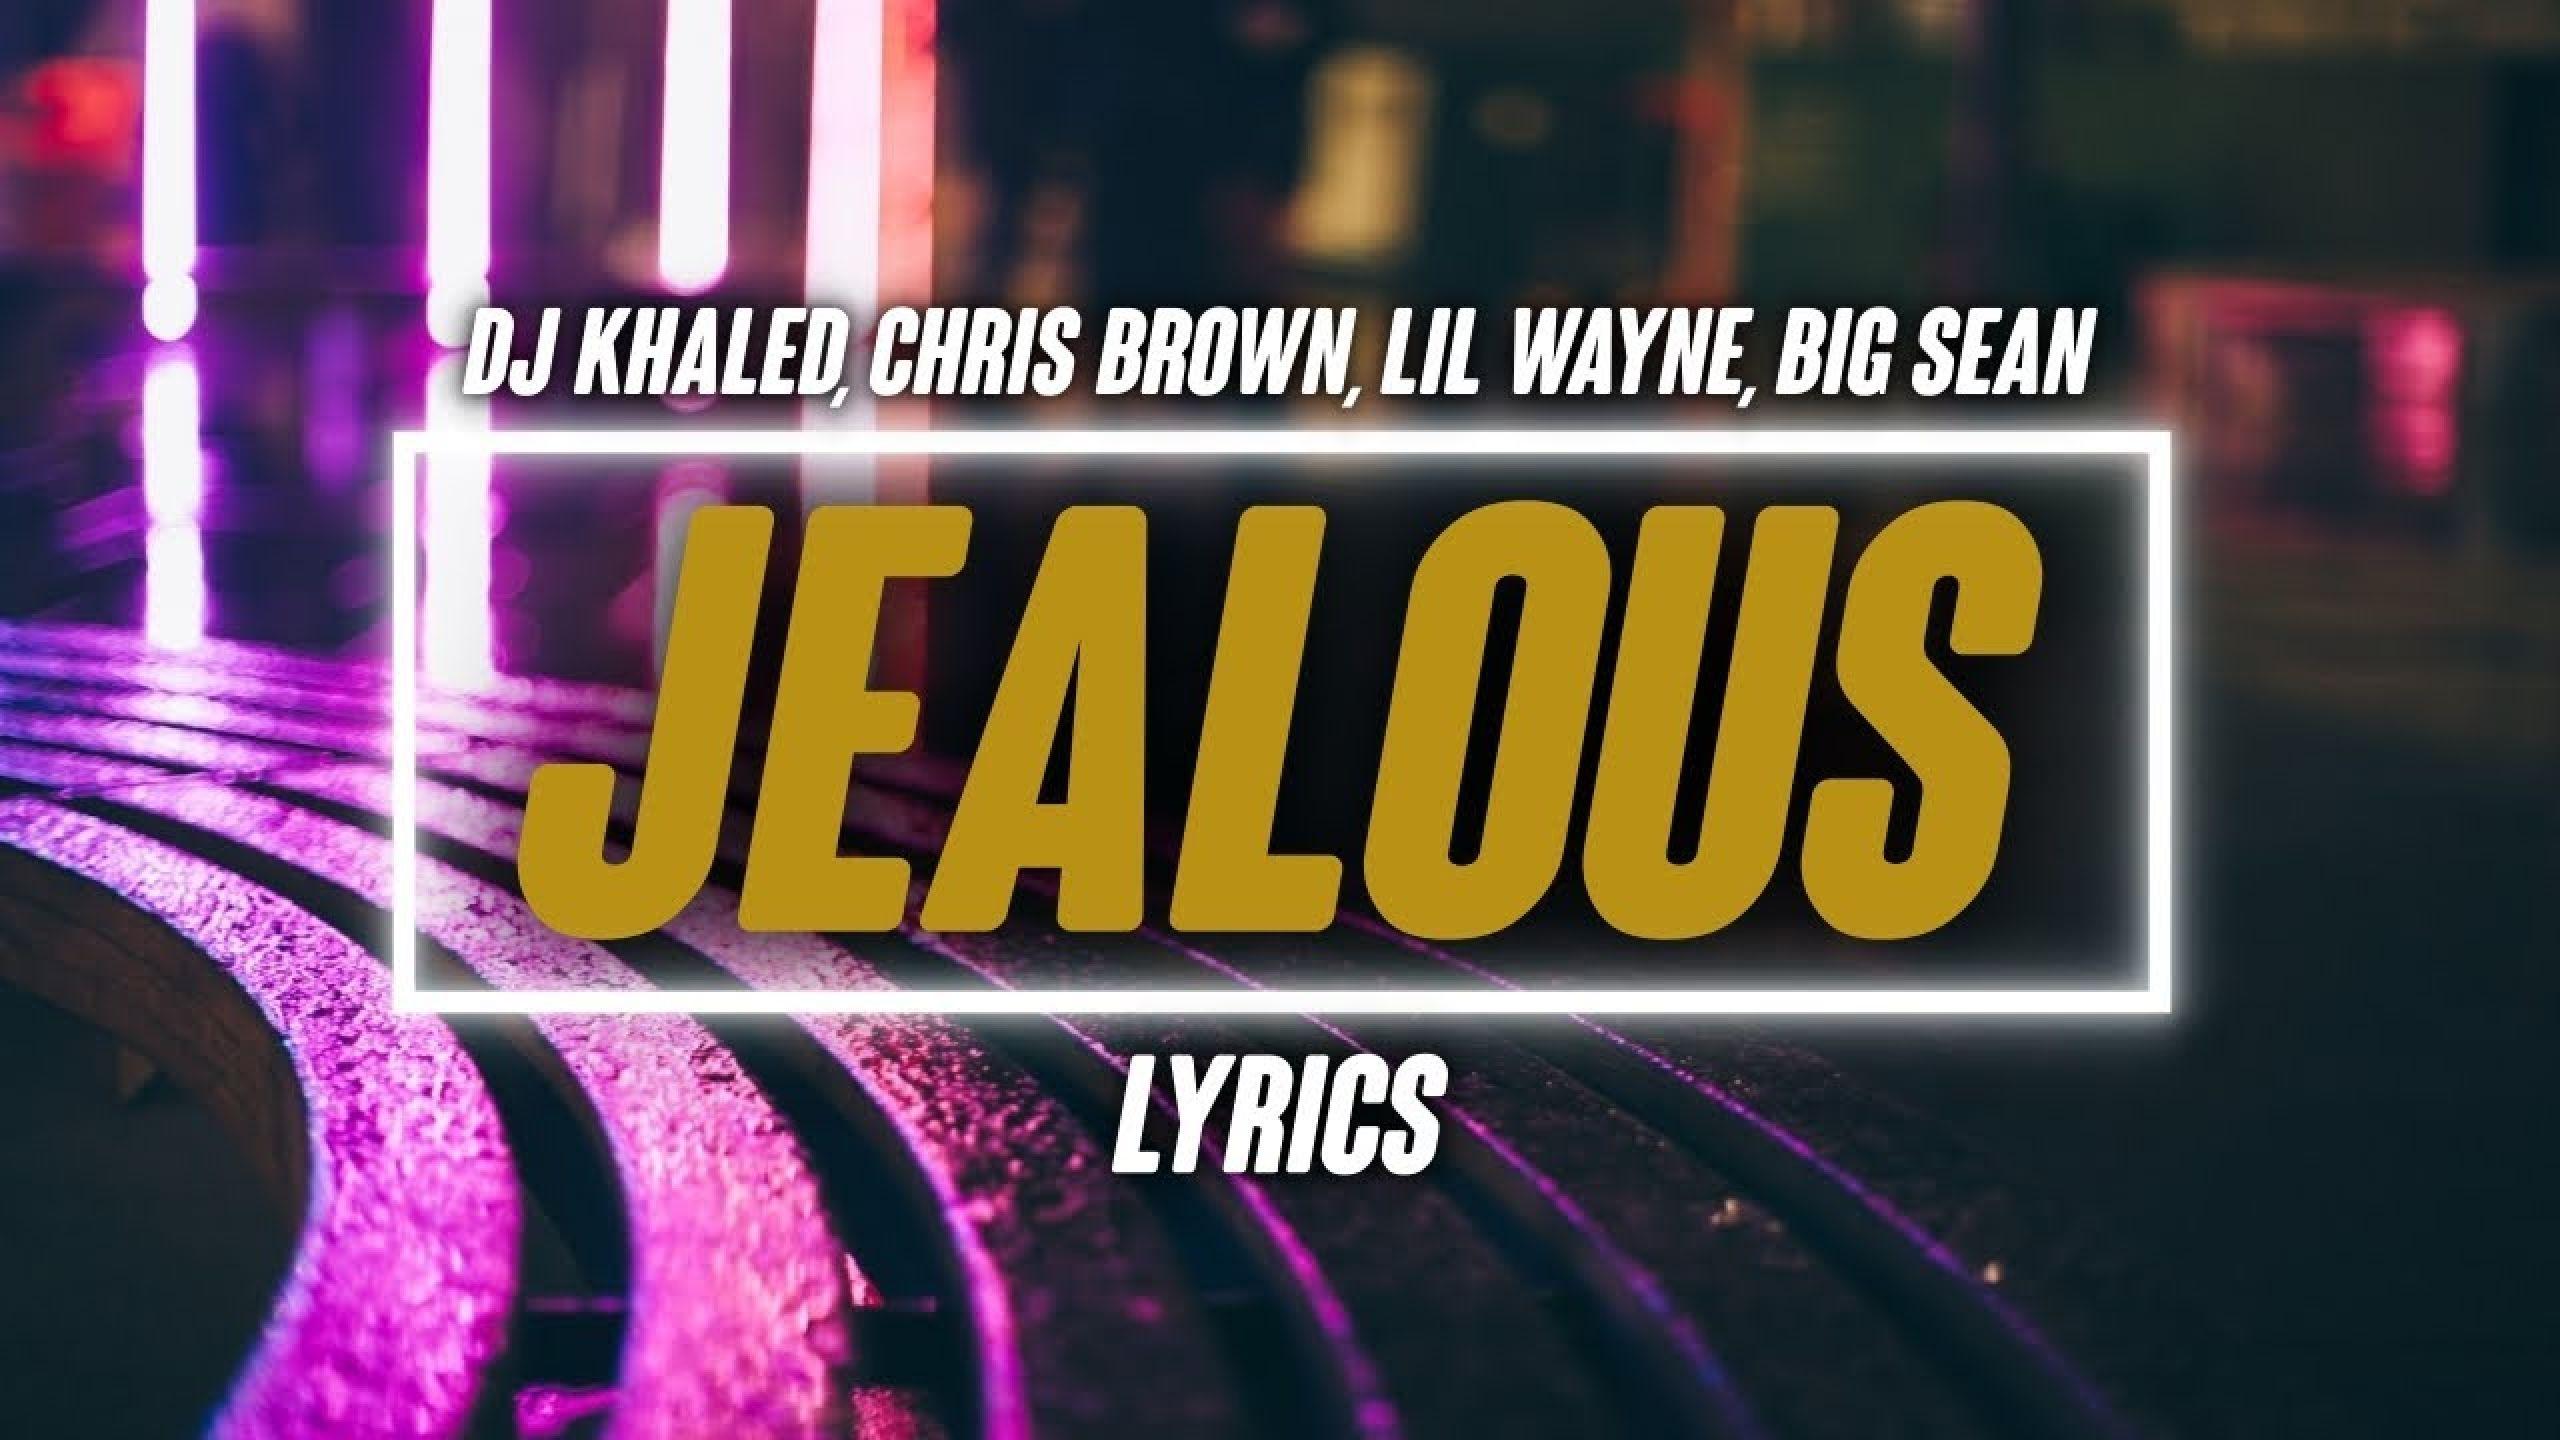 DJ Khaled - Jealous ft. Chris Brown, Lil Wayne, Big Sean (Lyrics)